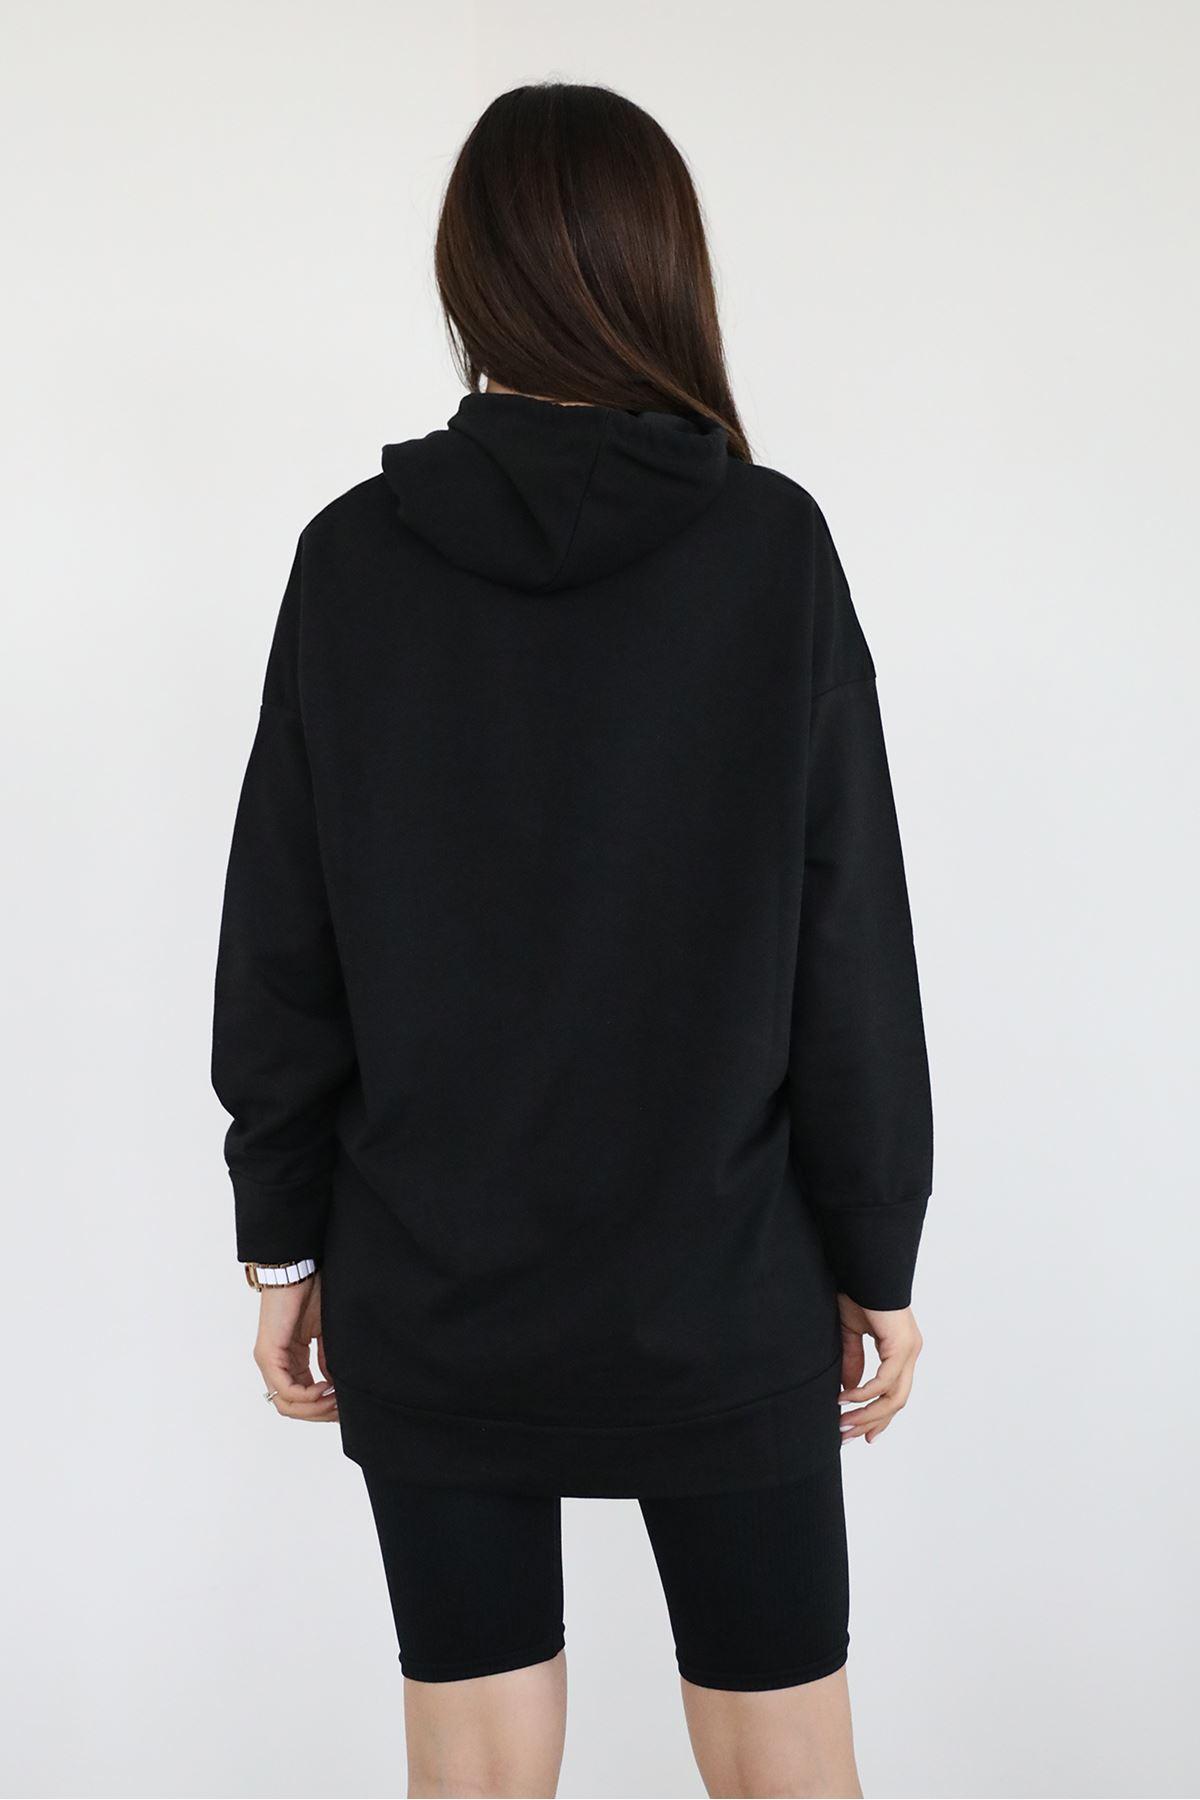 Cep Detay Sweatshirt-Siyah